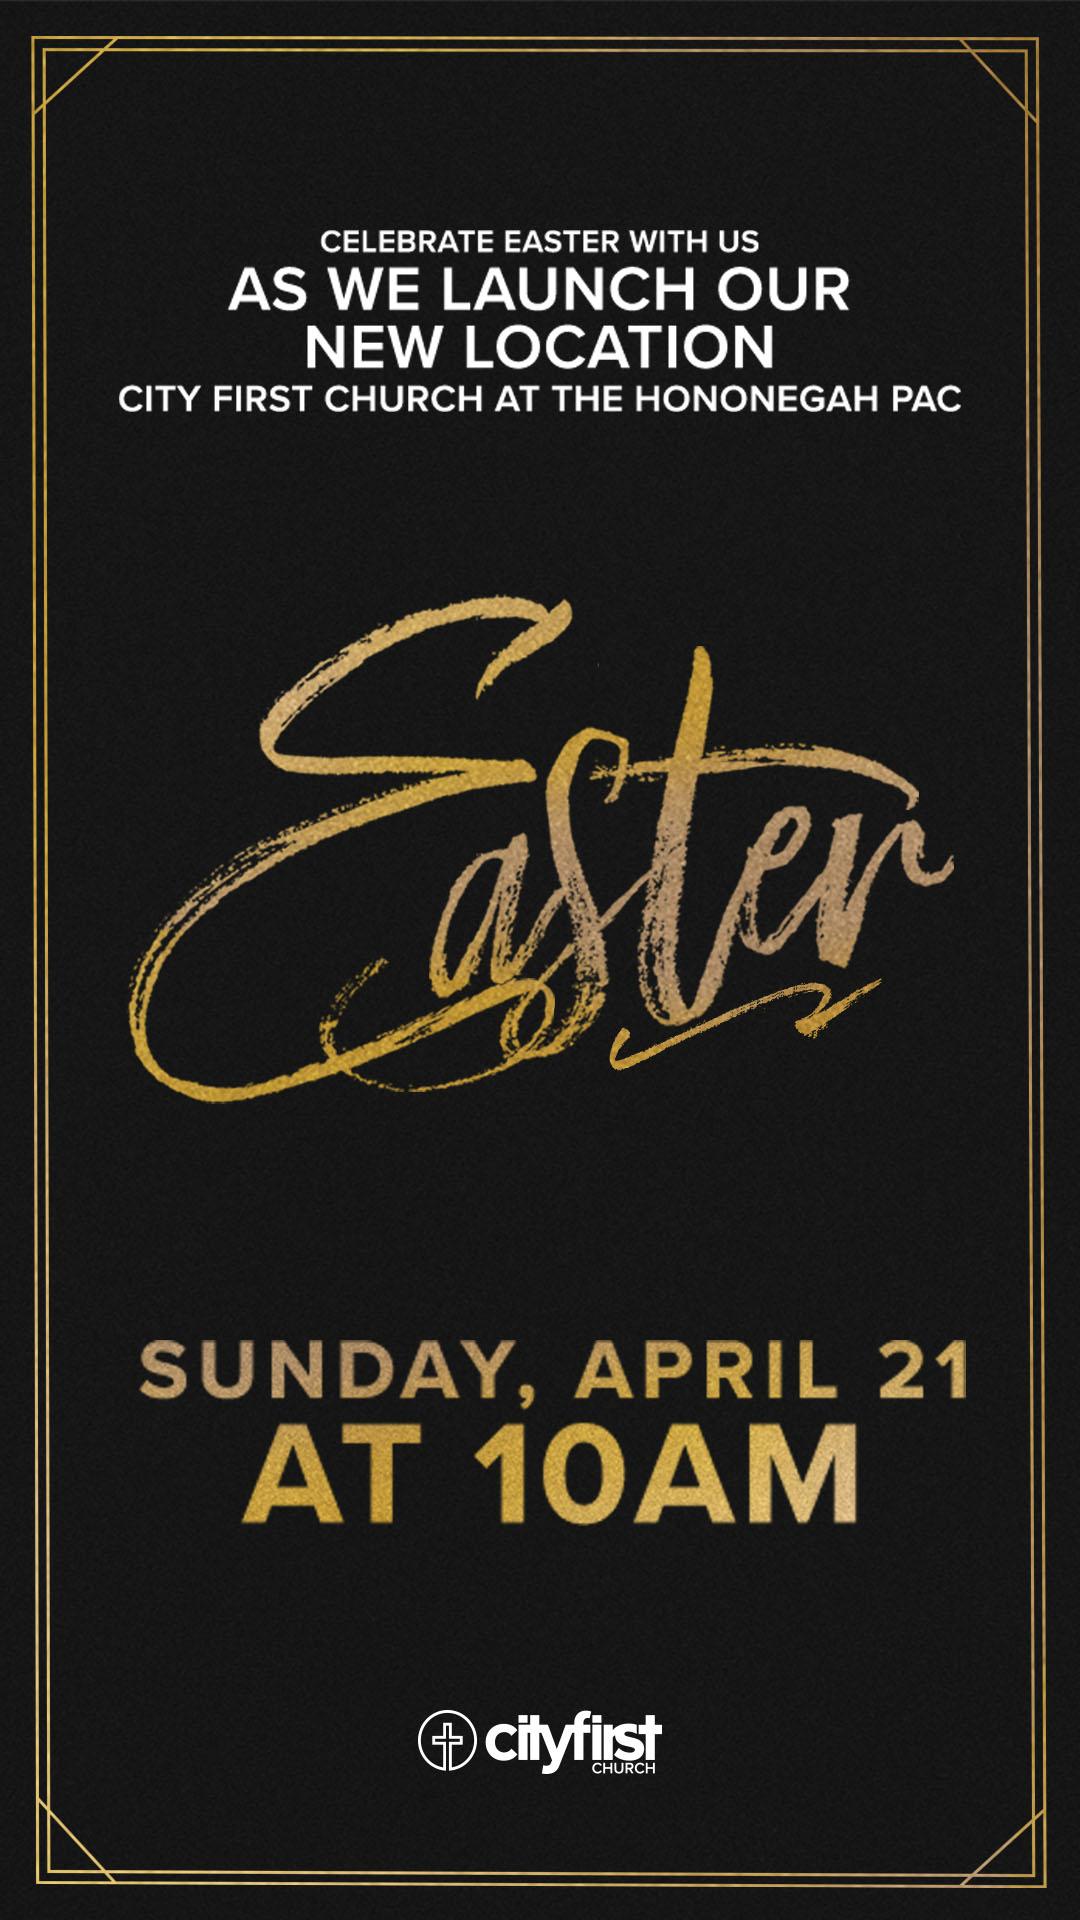 Share Easter (Hononegah) | City First Church